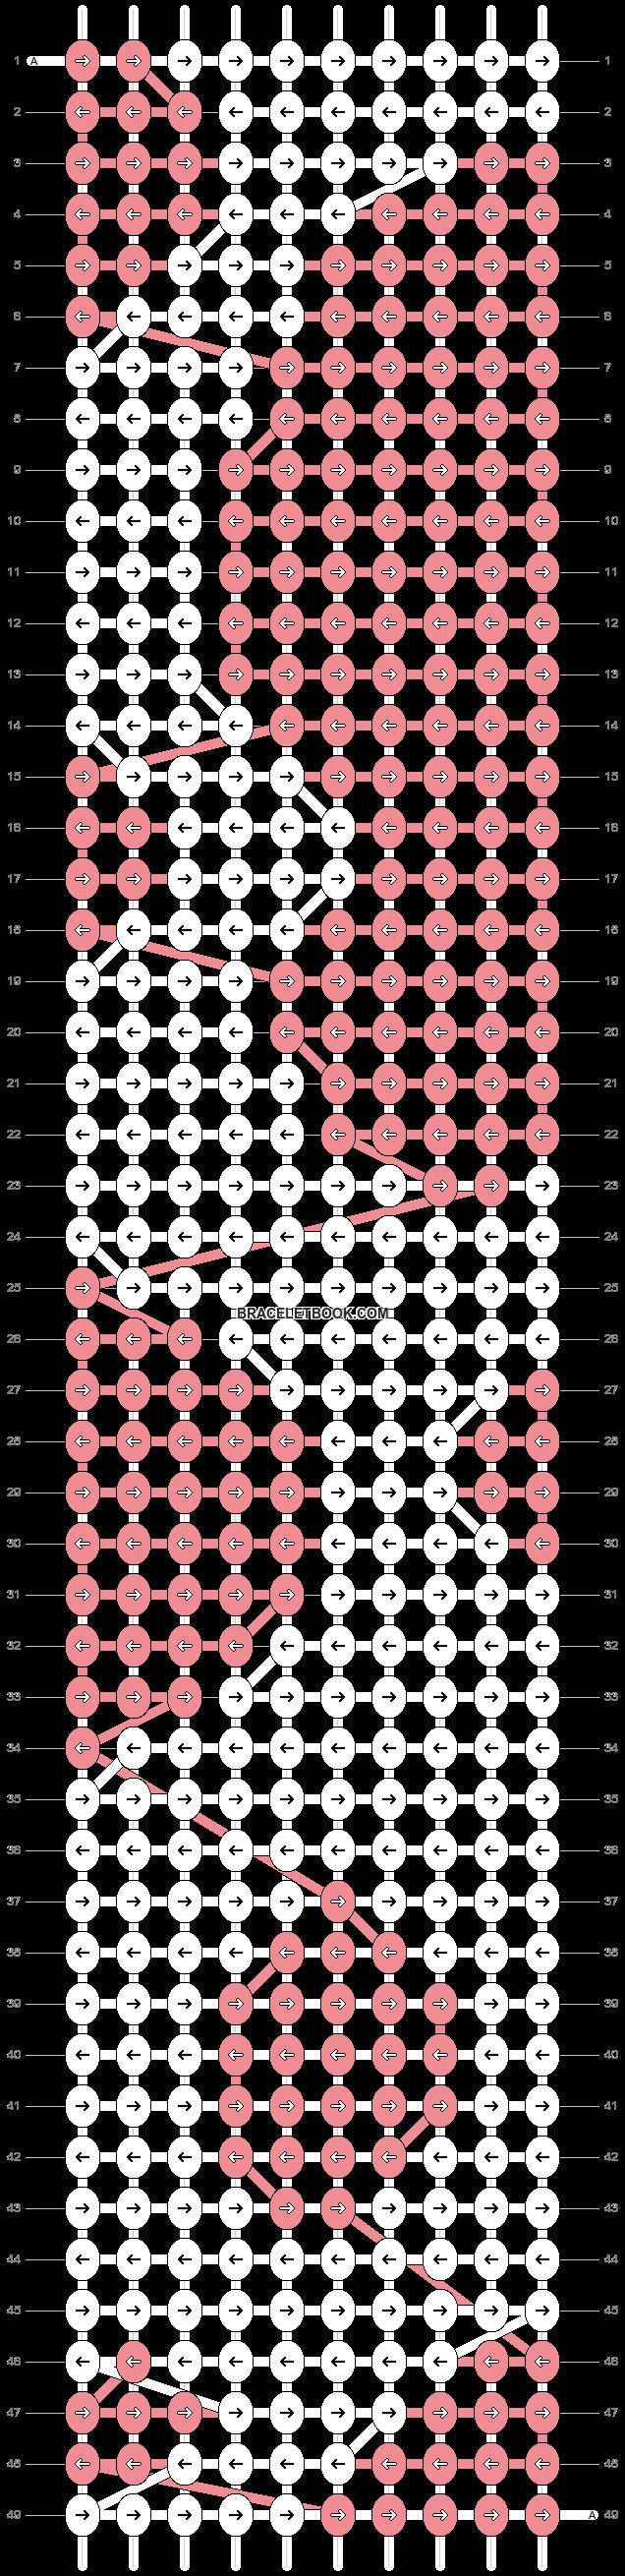 Alpha pattern #70381 pattern